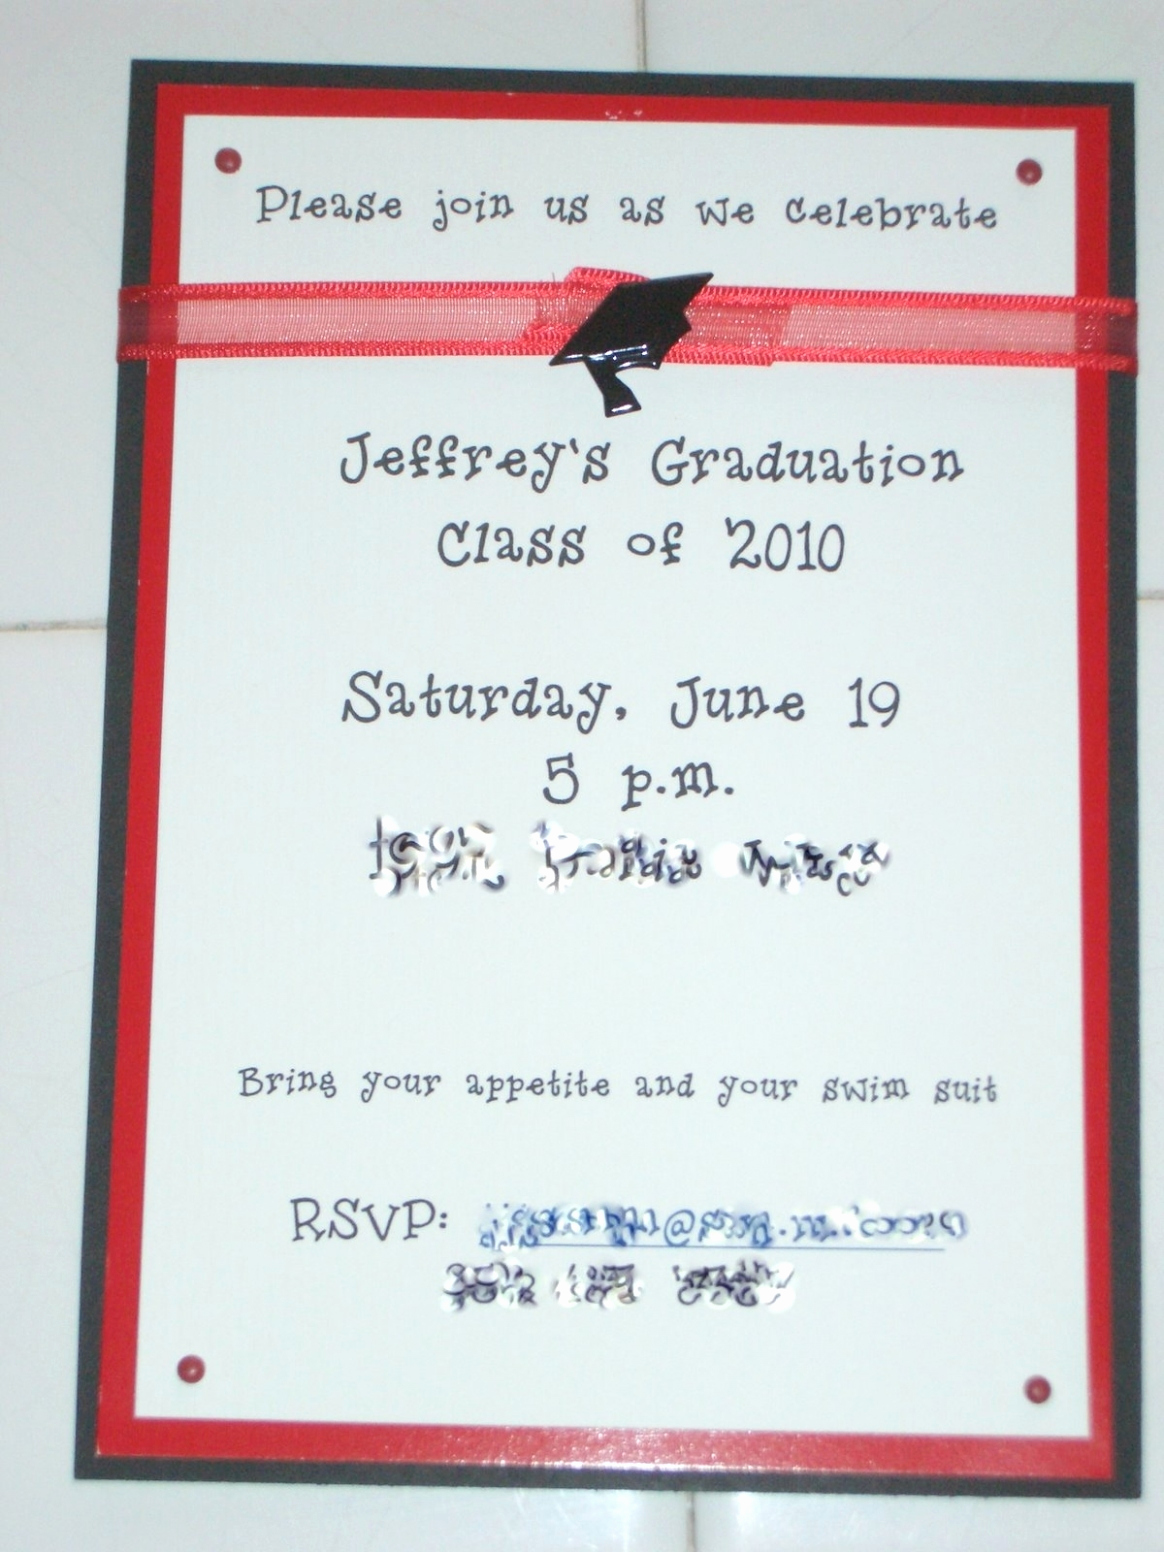 Catchy Graduation Invitation Phrases Fresh Funny Graduation Party Invitation Wording